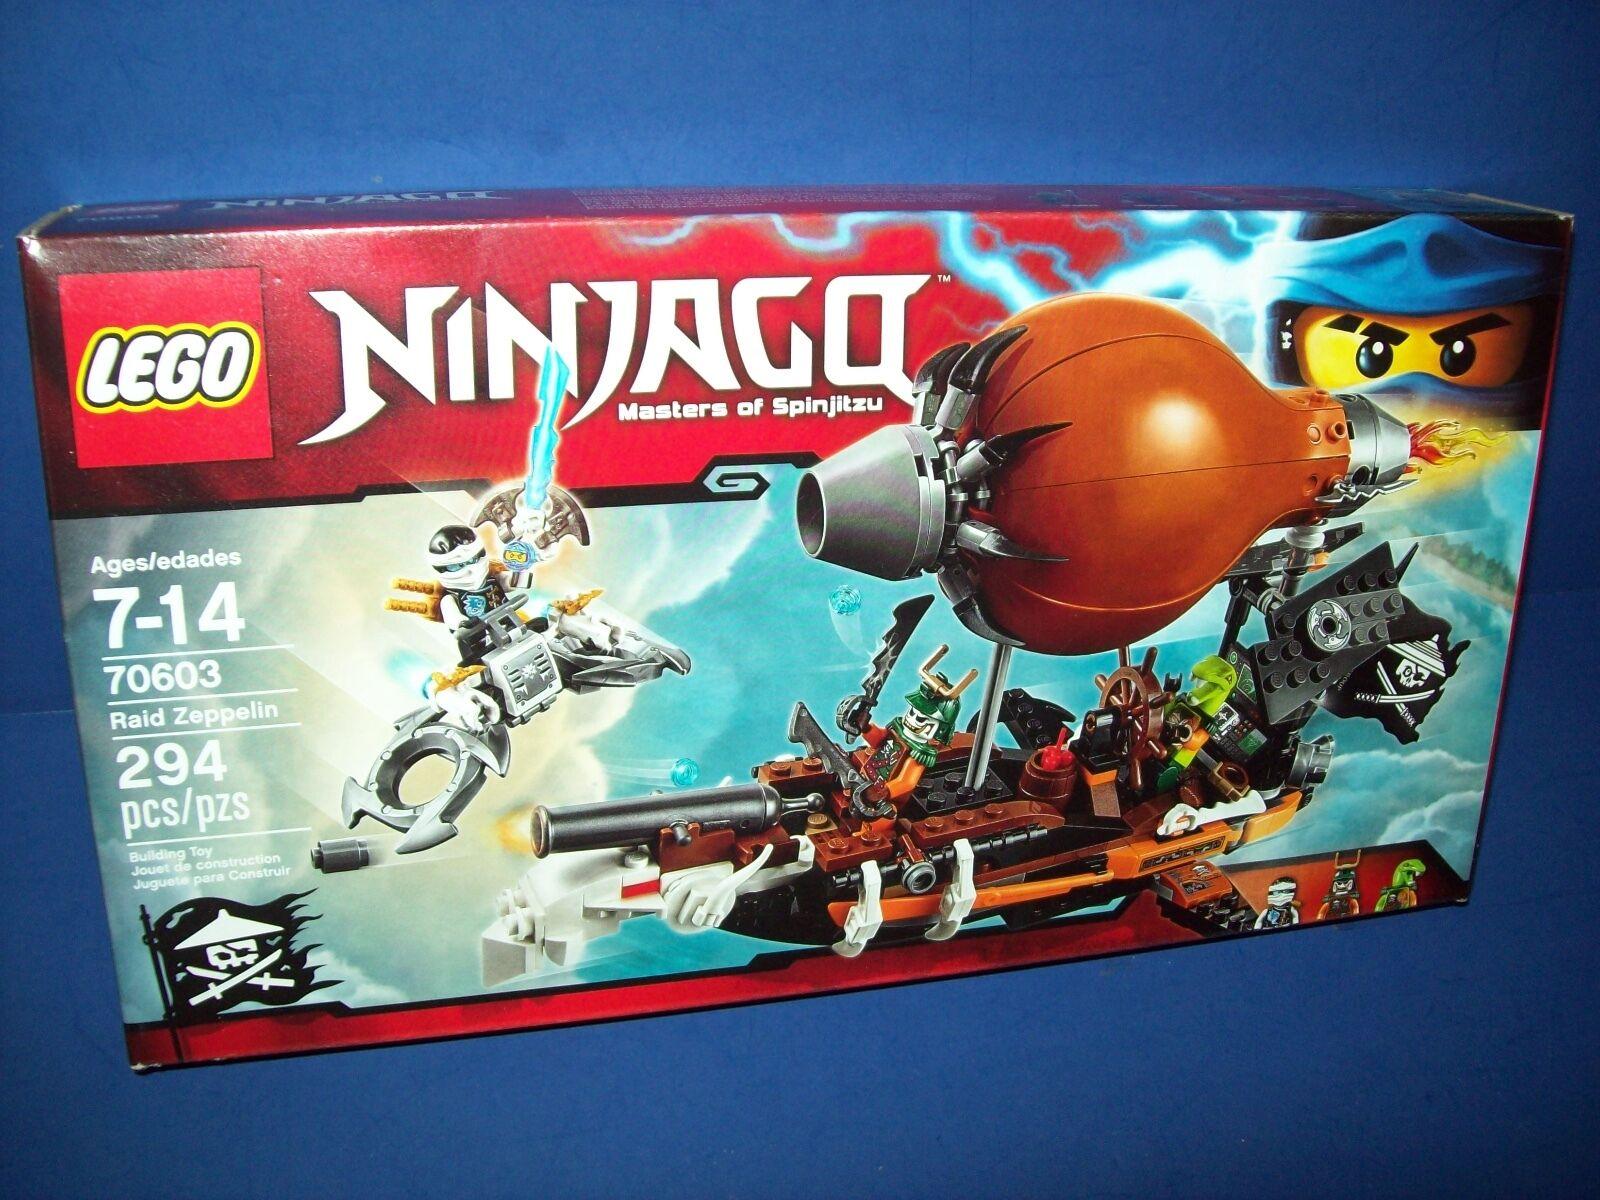 Lego NINJAGO 70603  Masters of Spinjitsu - RAID ZEPPELIN 294 pcs sealed